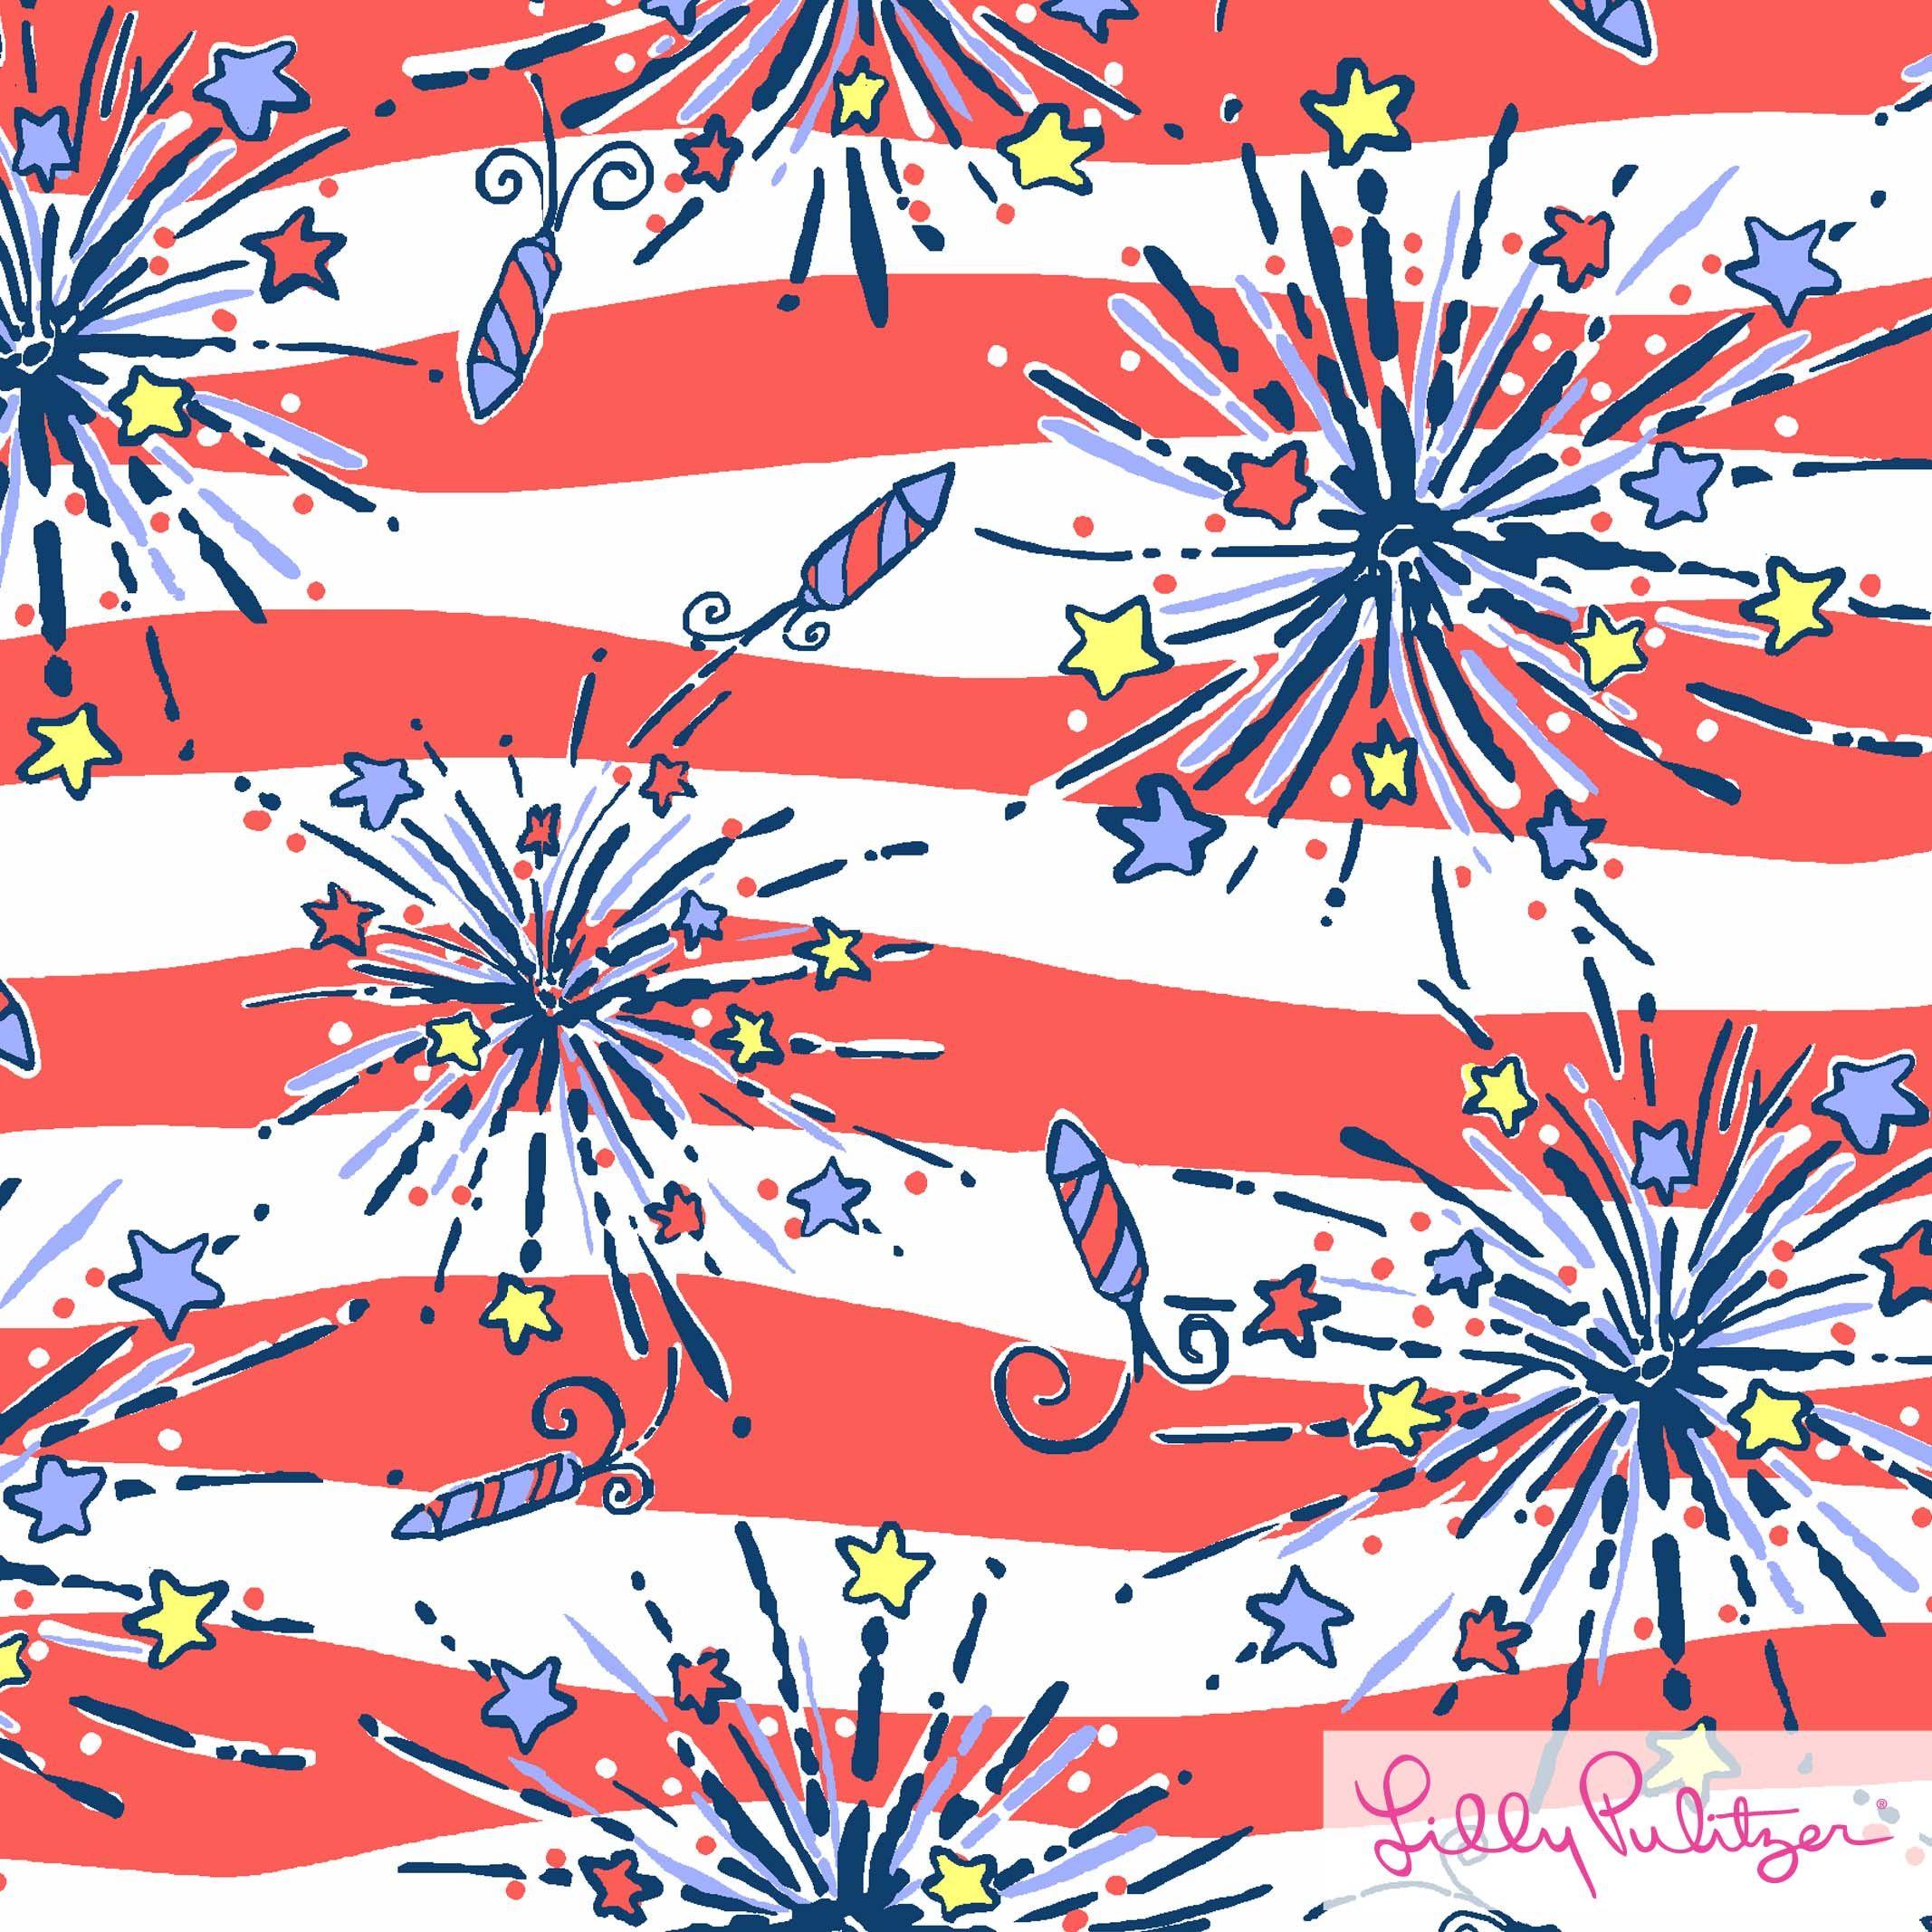 lp 4th of july print art design Lilly pulitzer prints 2134x2134